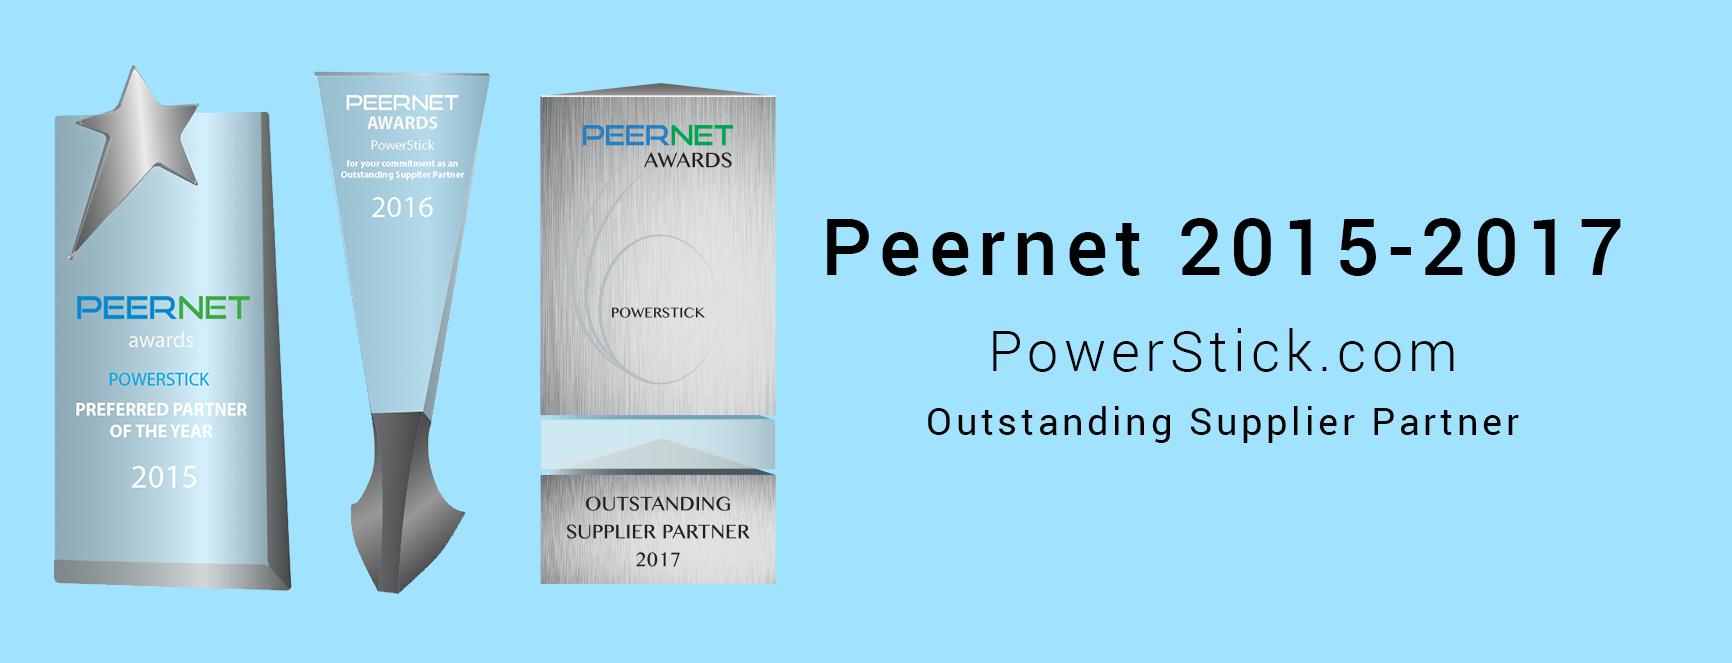 Peernet Outstanding Supplier Award 2015-2017